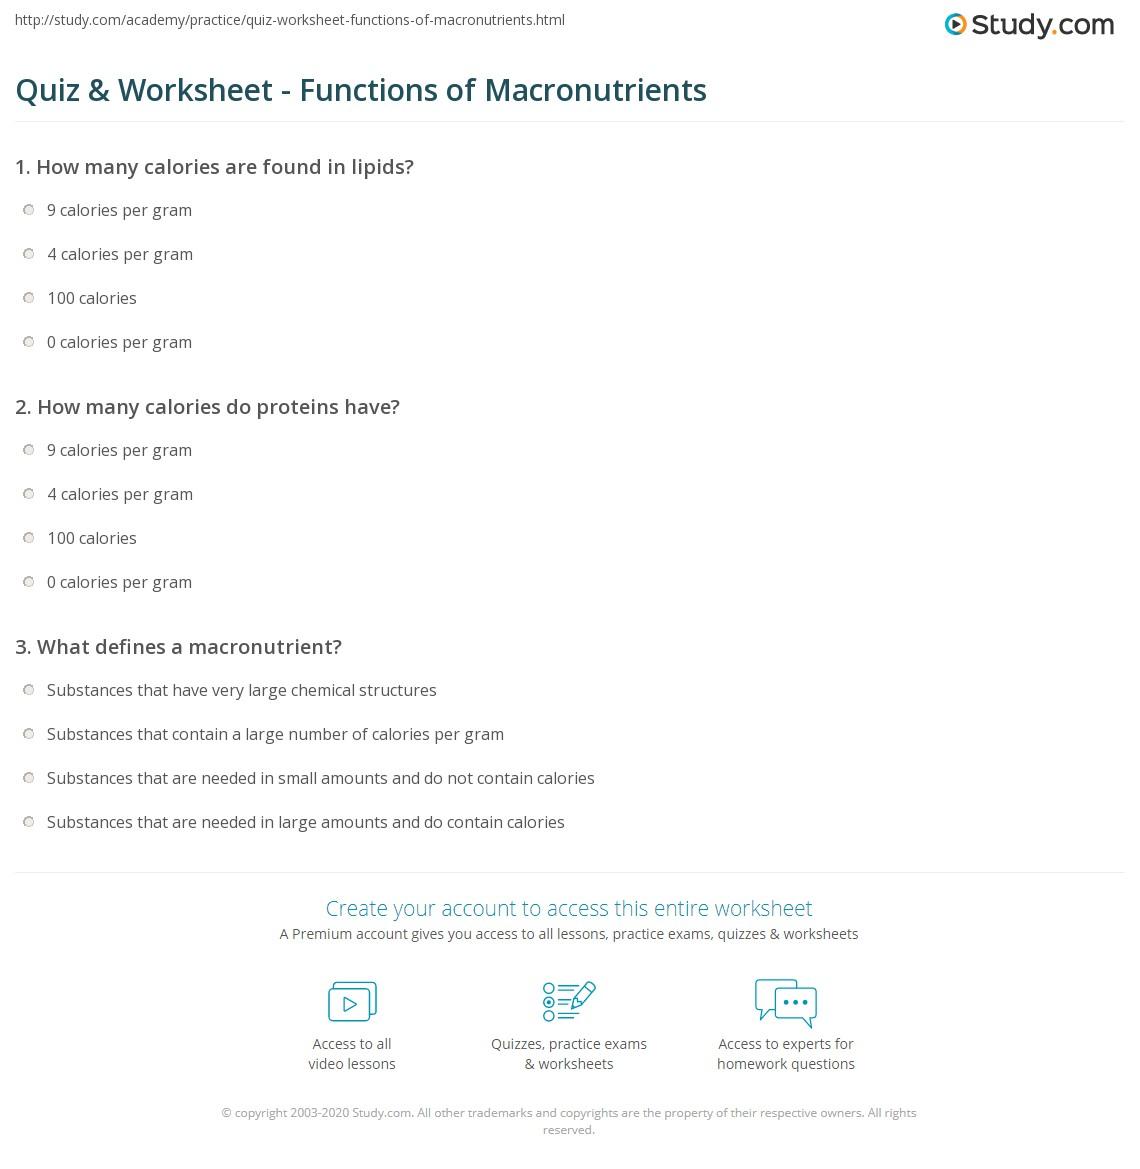 Quiz & Worksheet - Functions of Macronutrients   Study.com